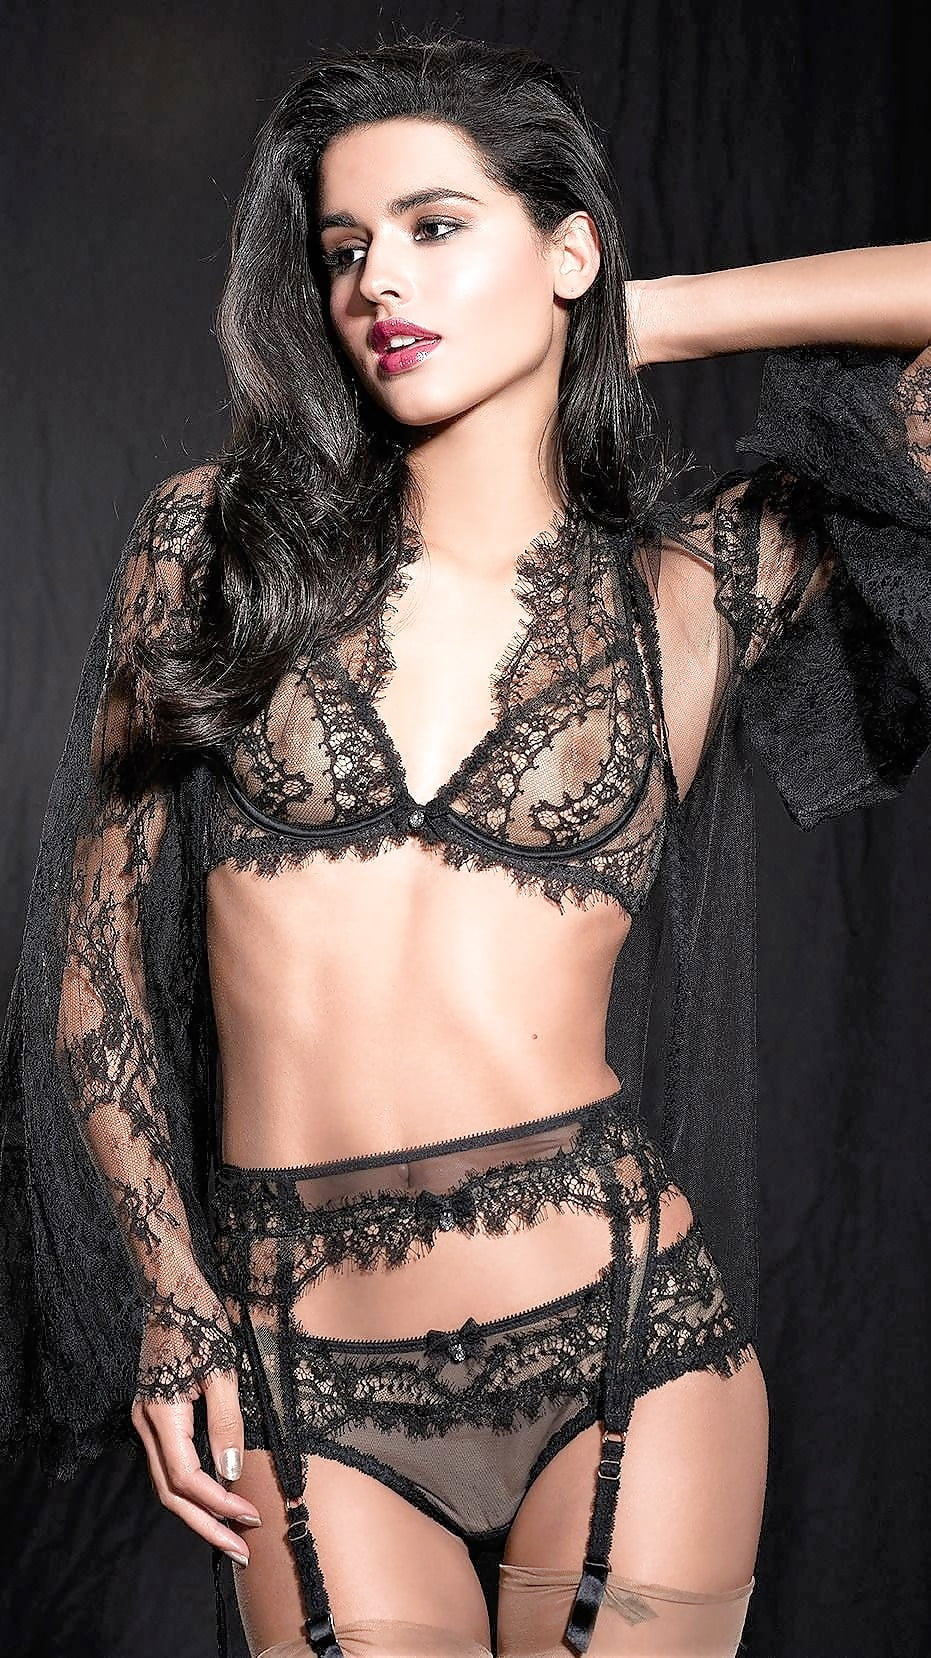 Women sexy lingerie underwear erotic corset lace mesh sleepwear nightwear set ukbra brief sets